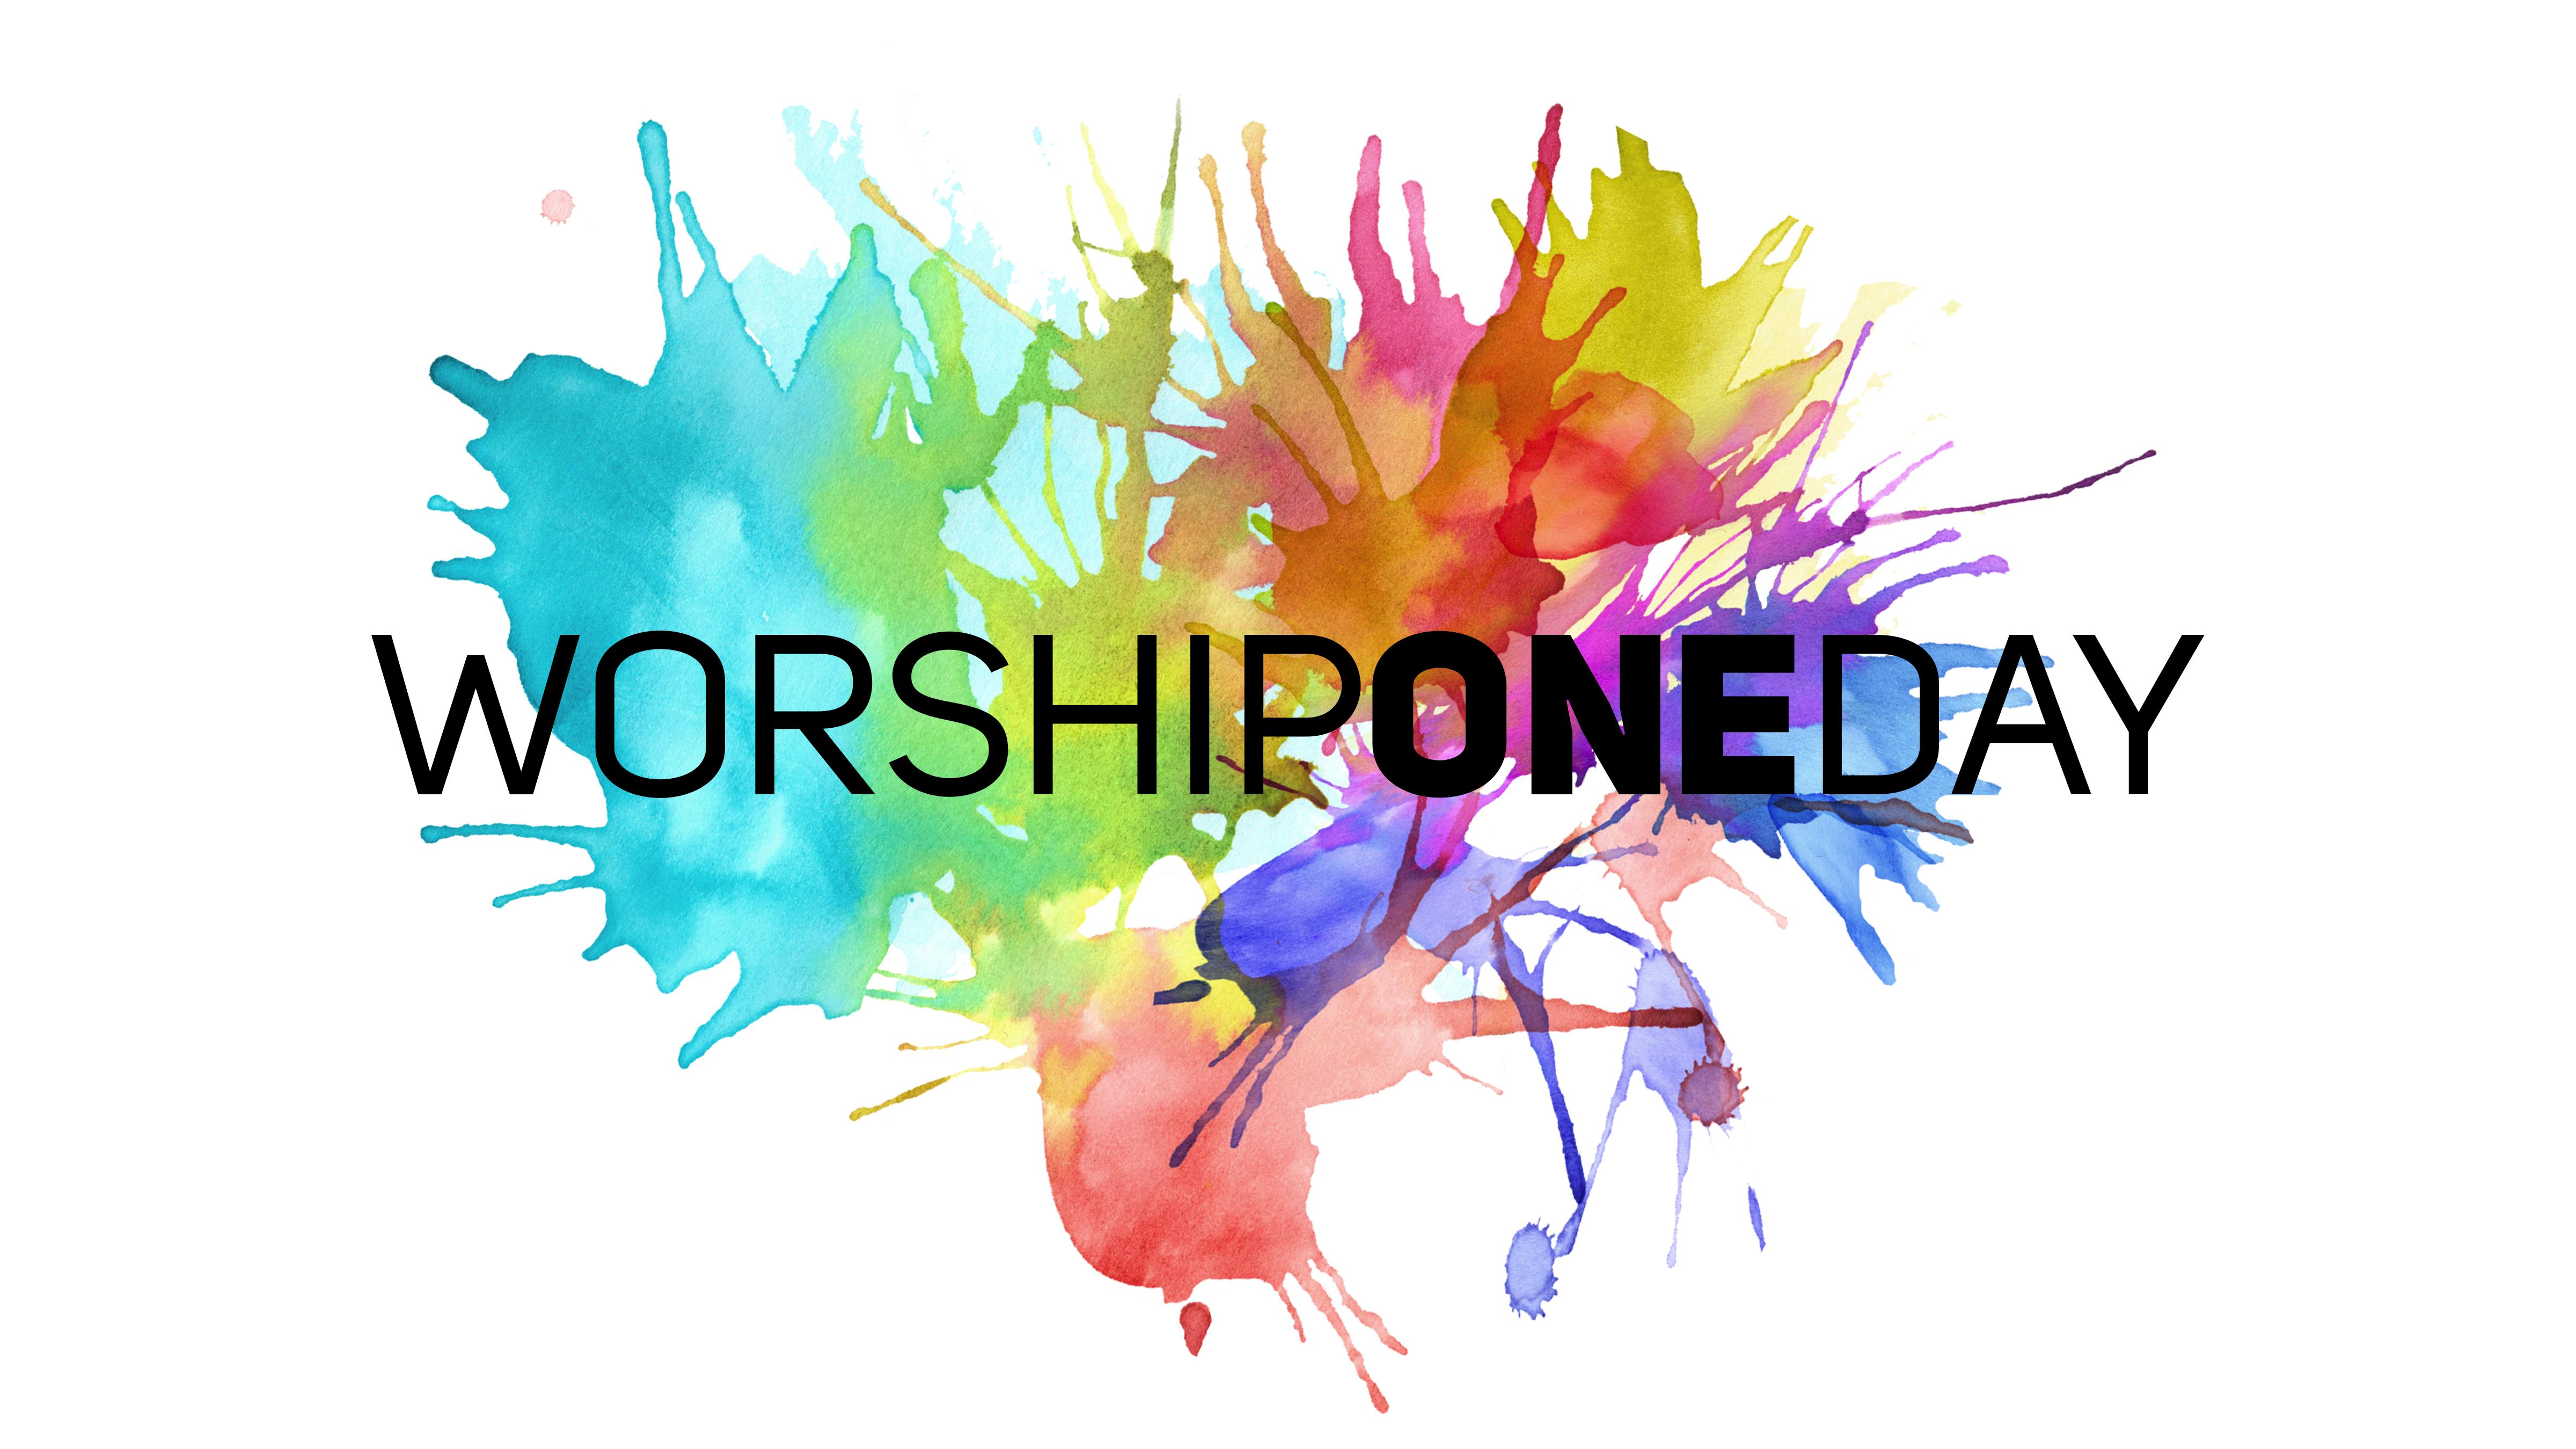 Worshiponeday graphic png